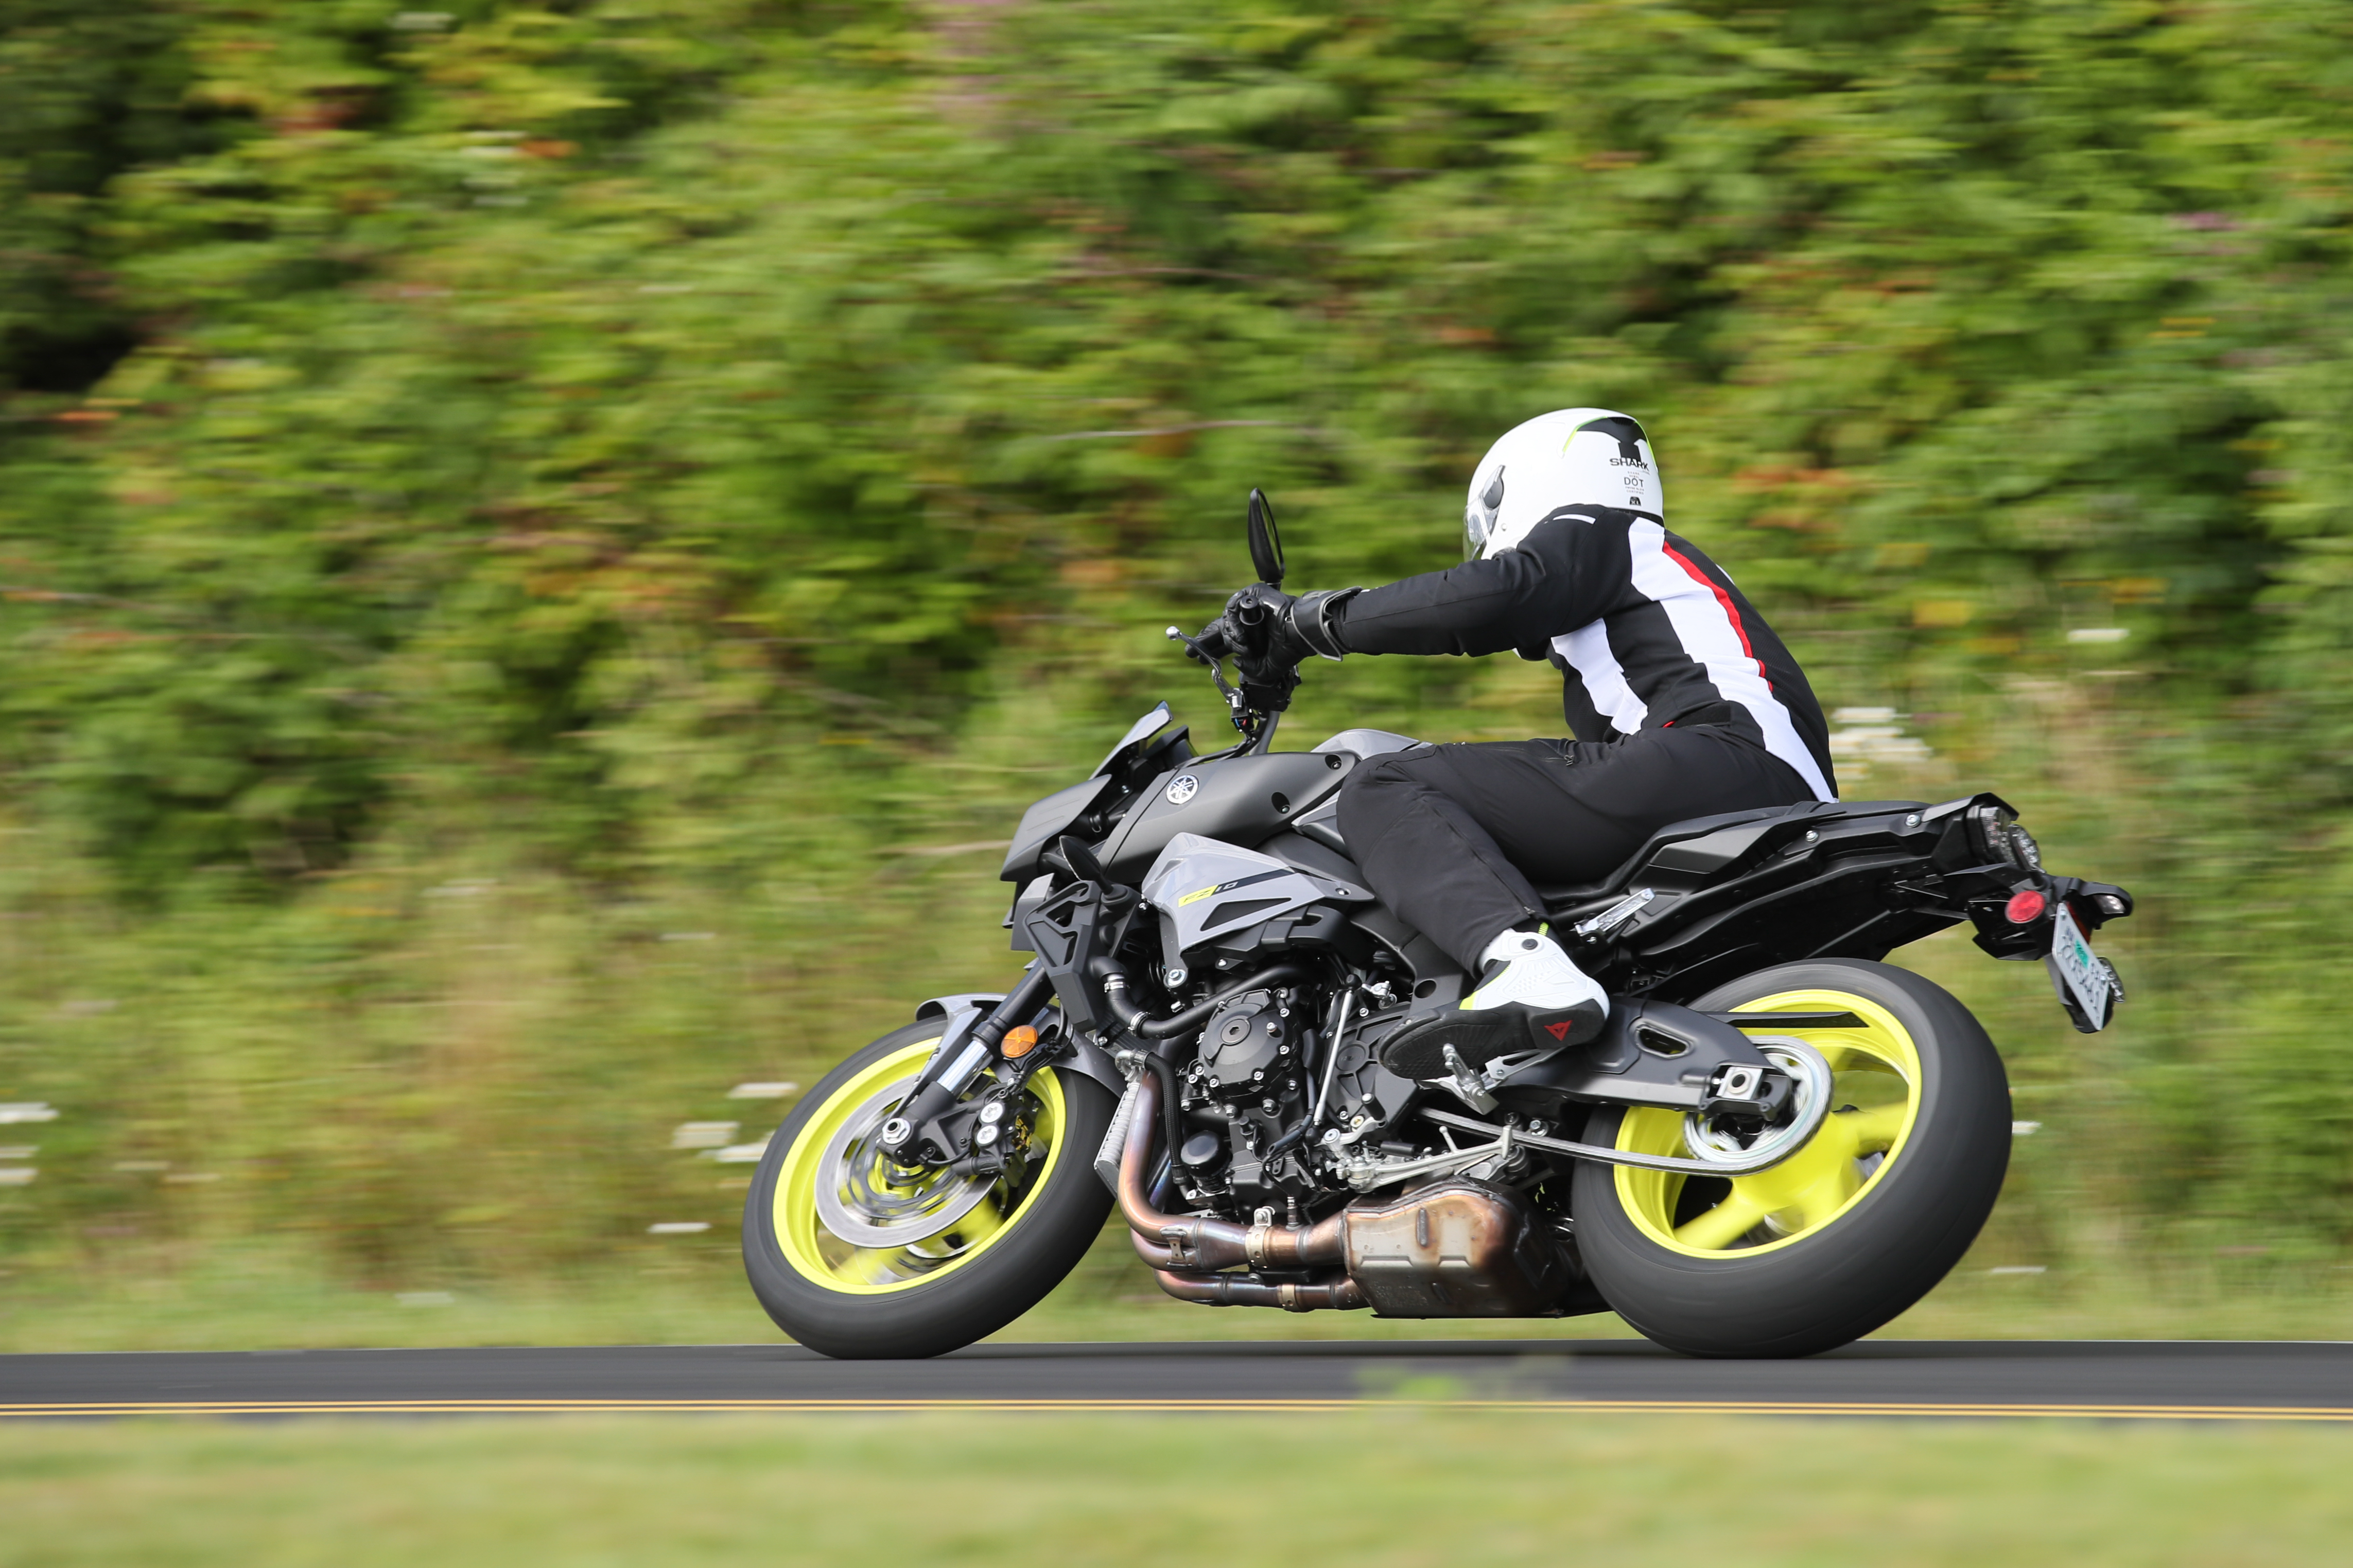 2017 Yamaha Fz 10 First Ride Review Revzilla